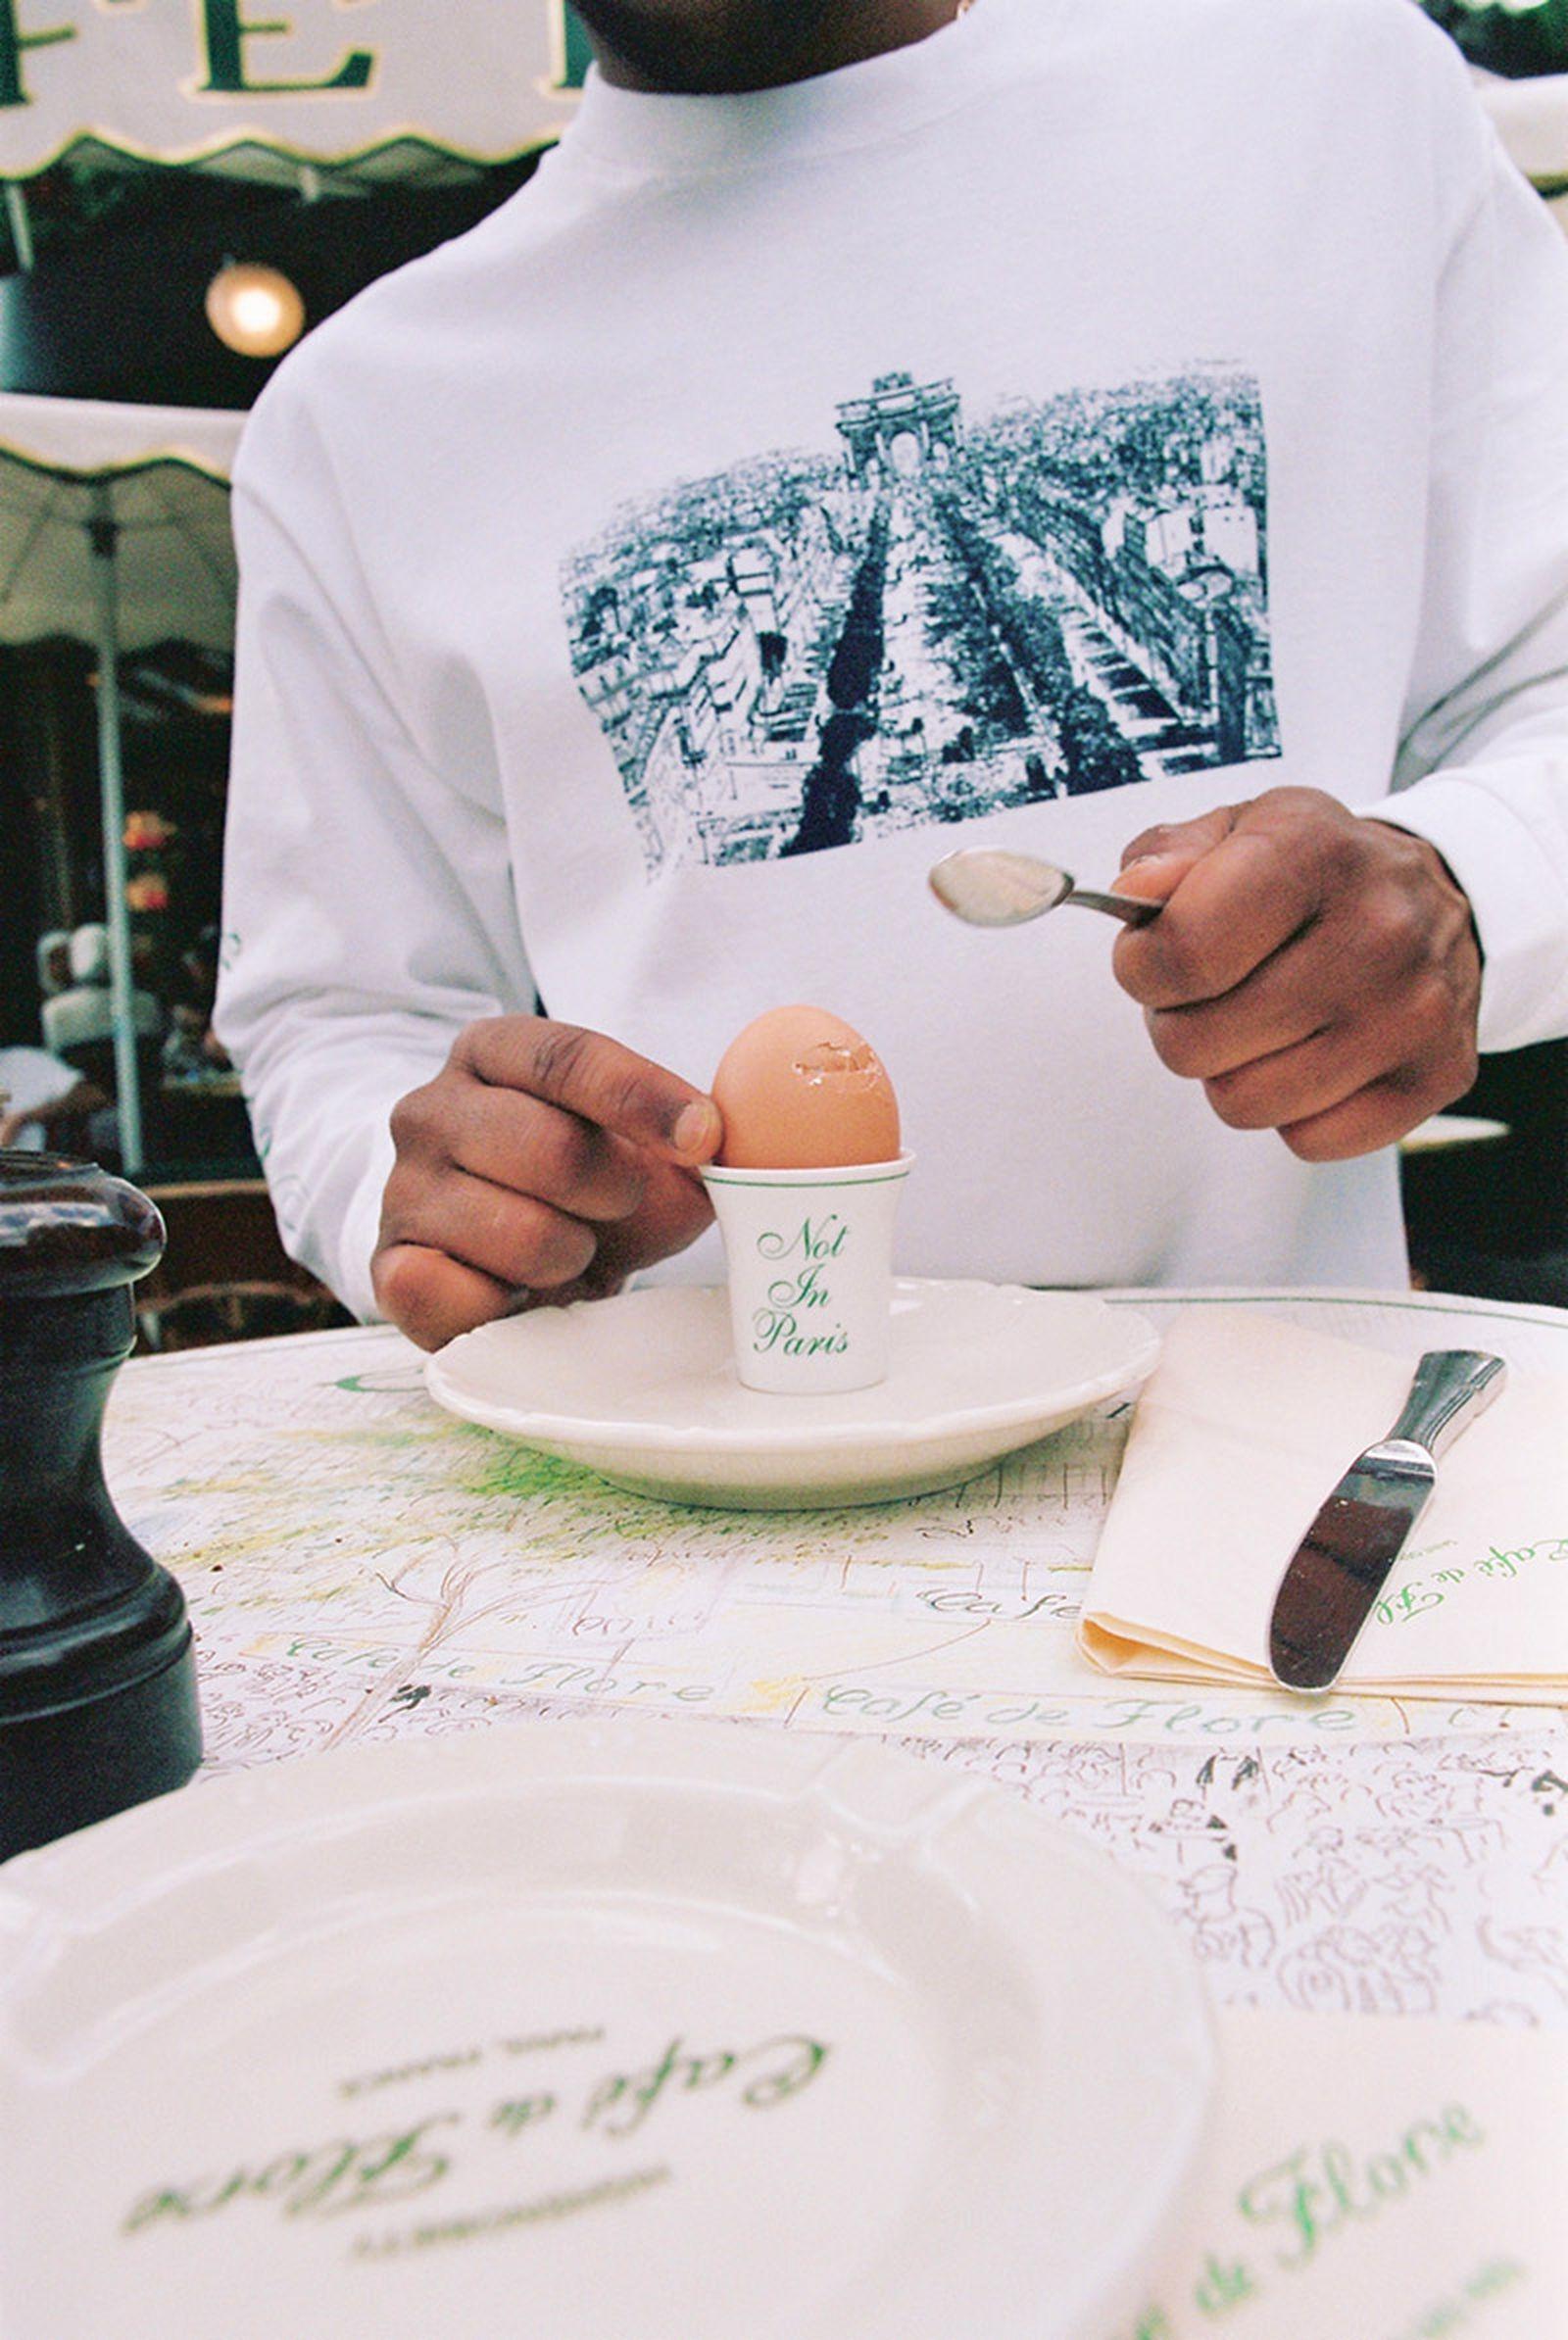 cafe-de-flore-fashion-week-not-in-paris-lookbook-08